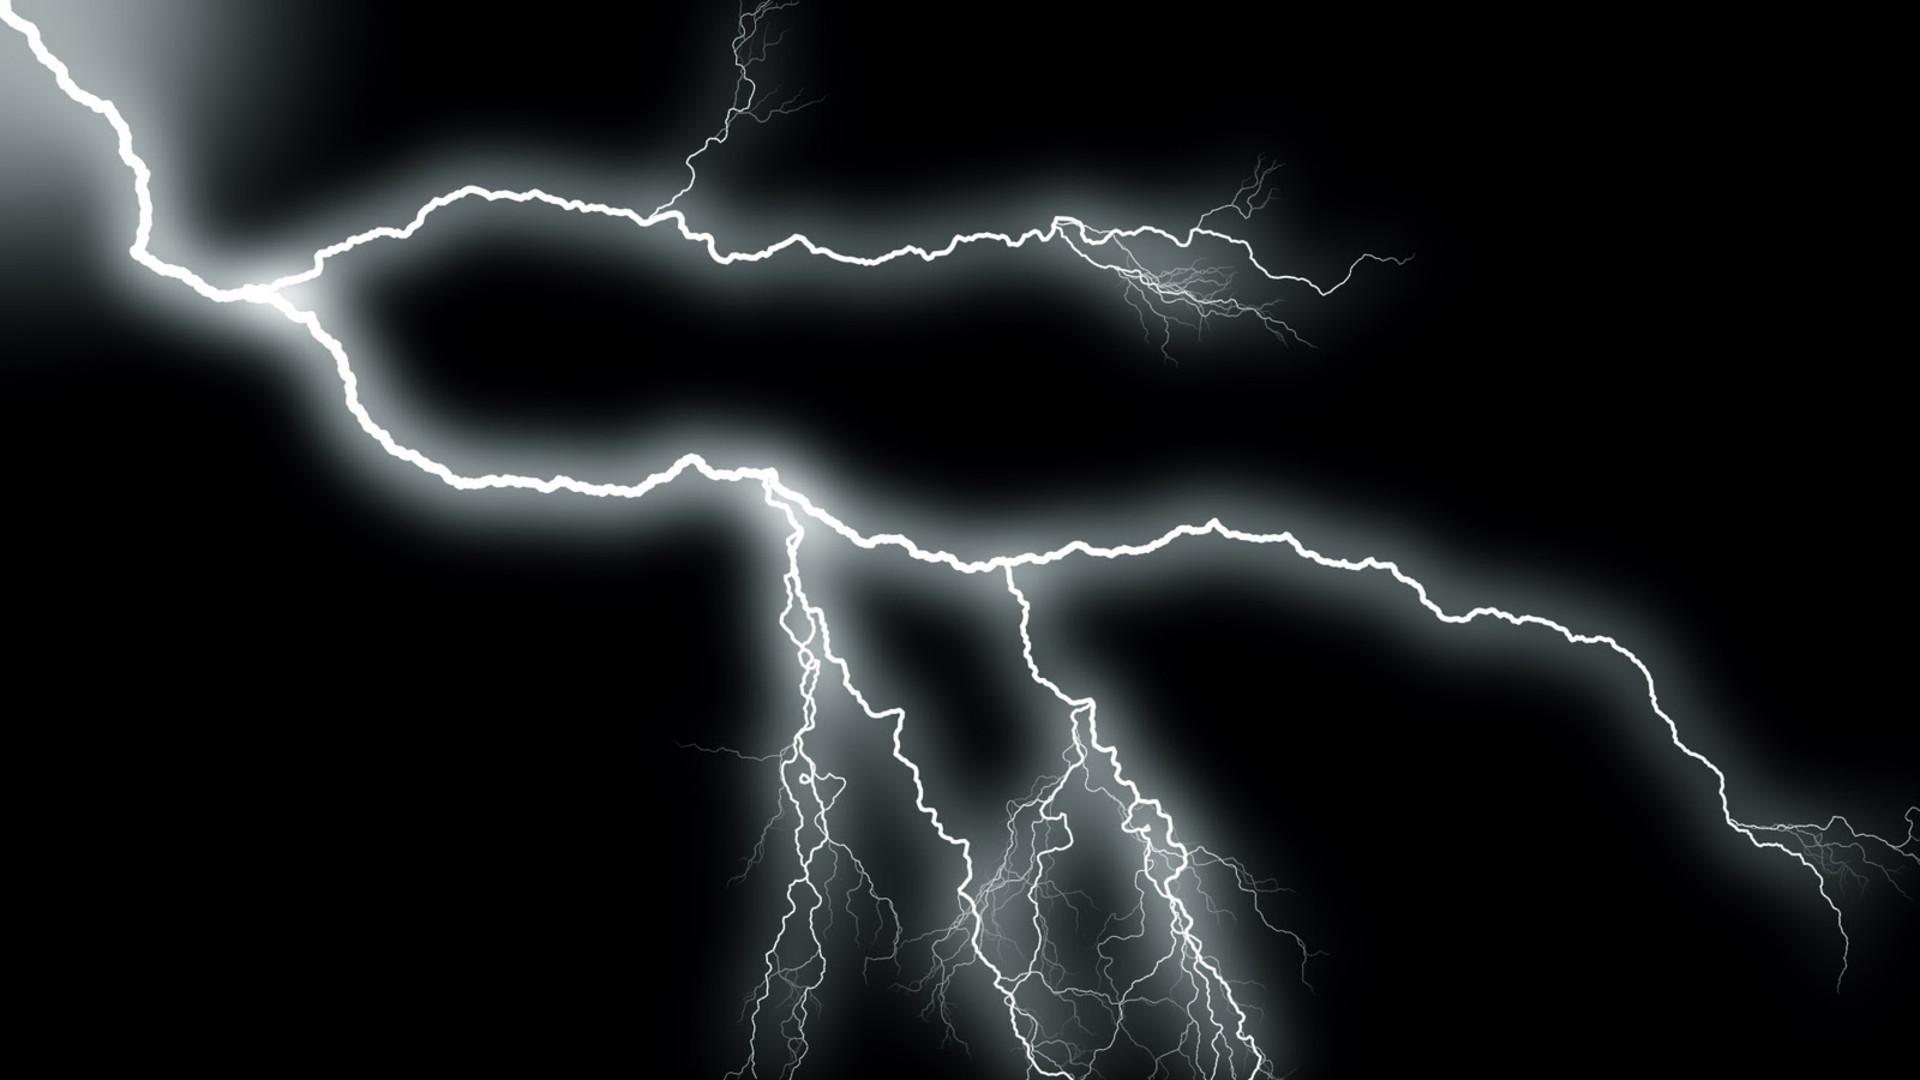 Lighting Bolt Wallpaper